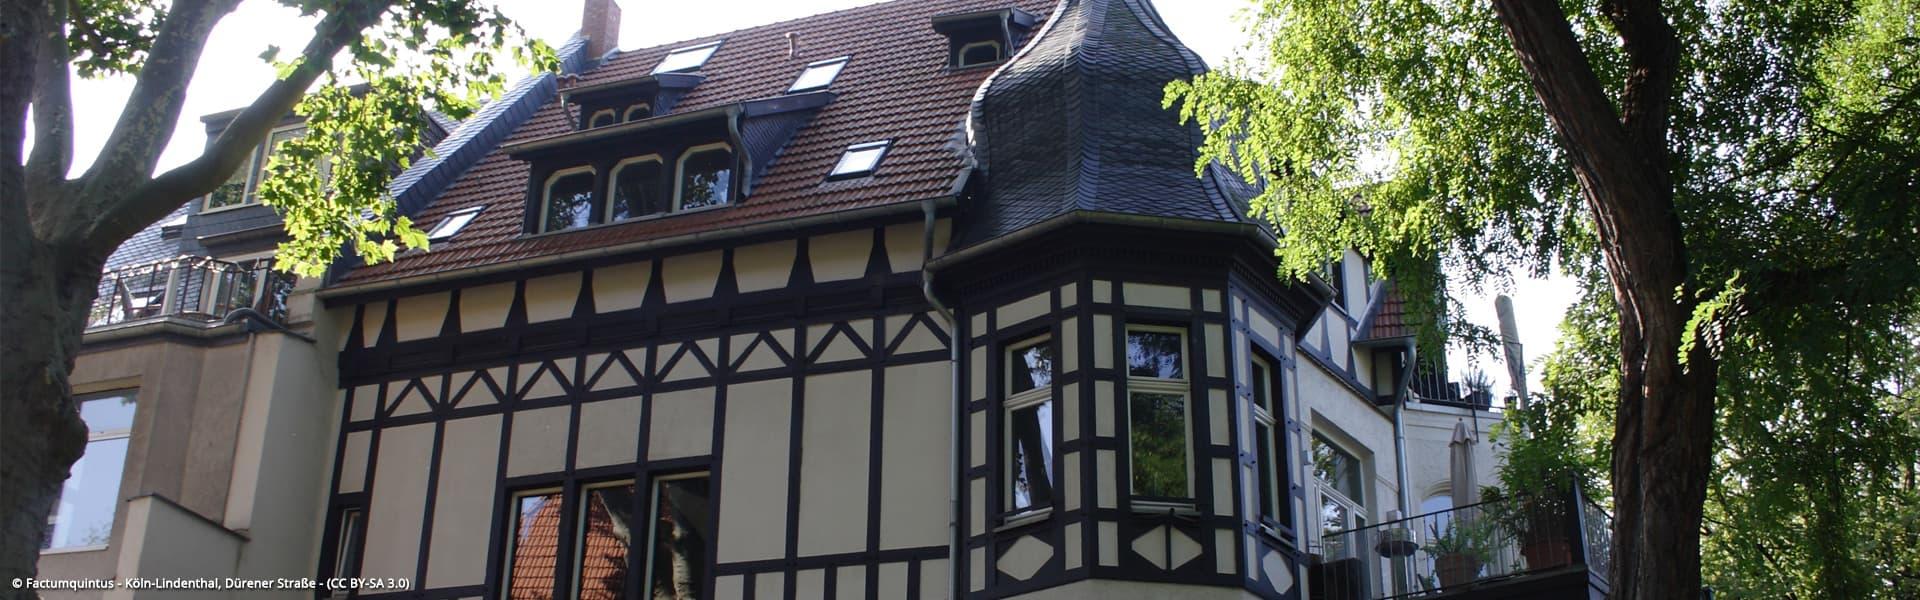 Köln-Lindenthal, Dürener Straße